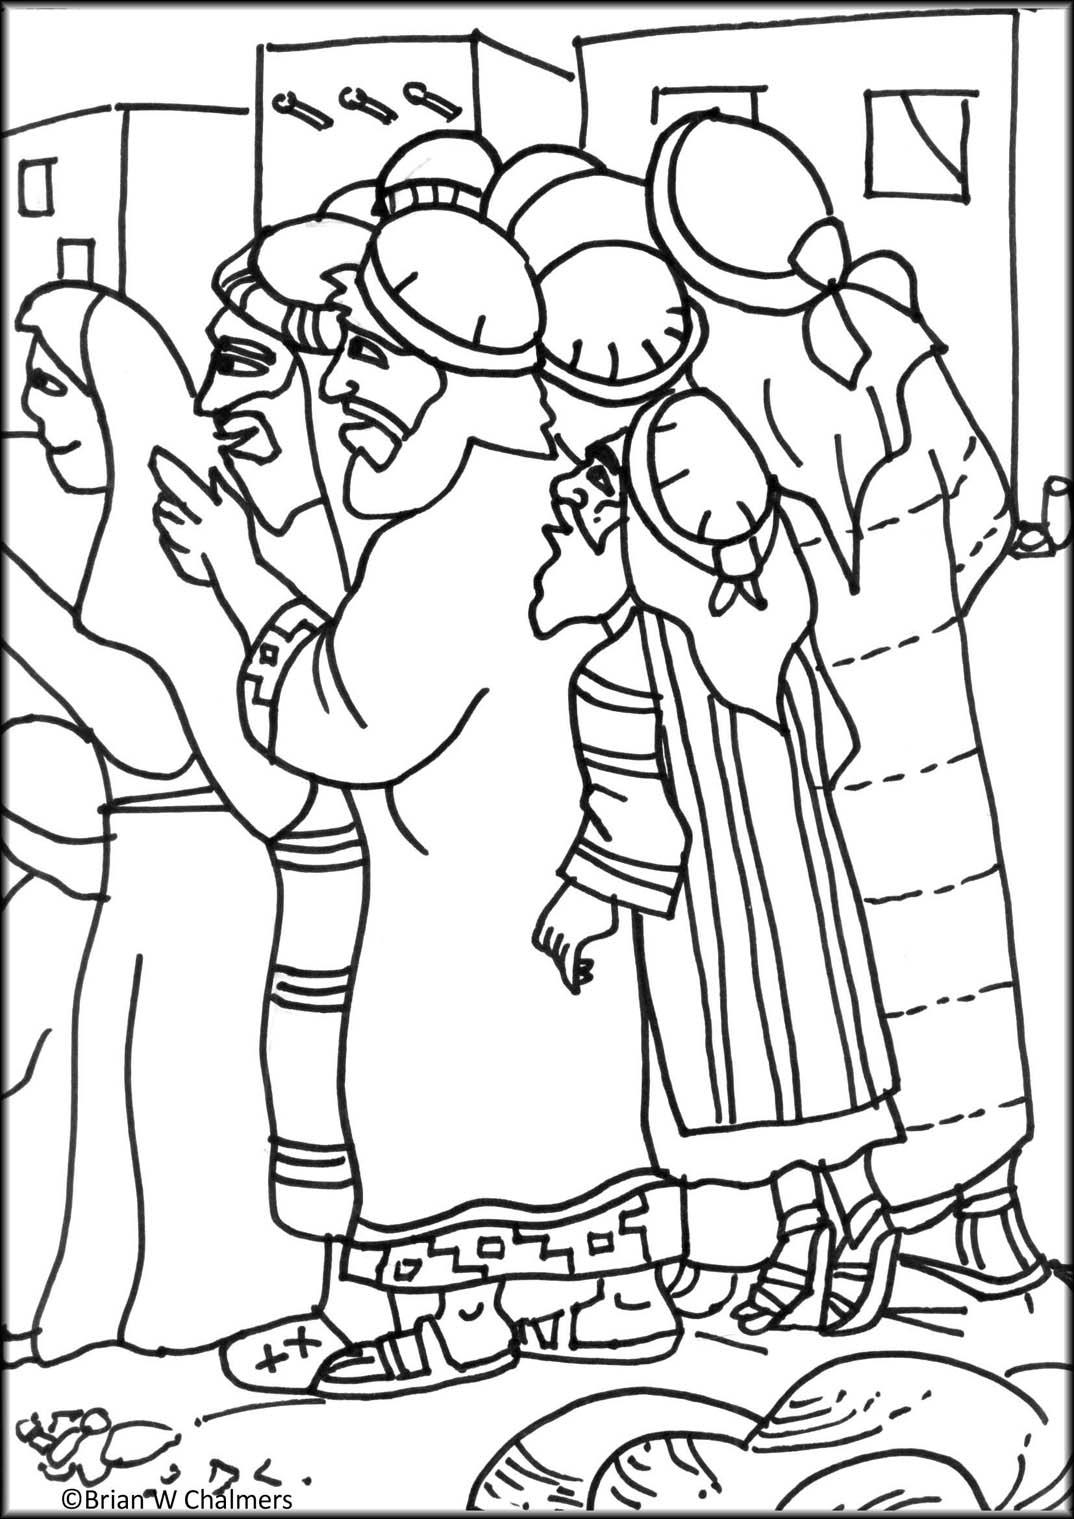 honesty coloring sheets bible verse coloring pages - Jesus Zacchaeus Coloring Page